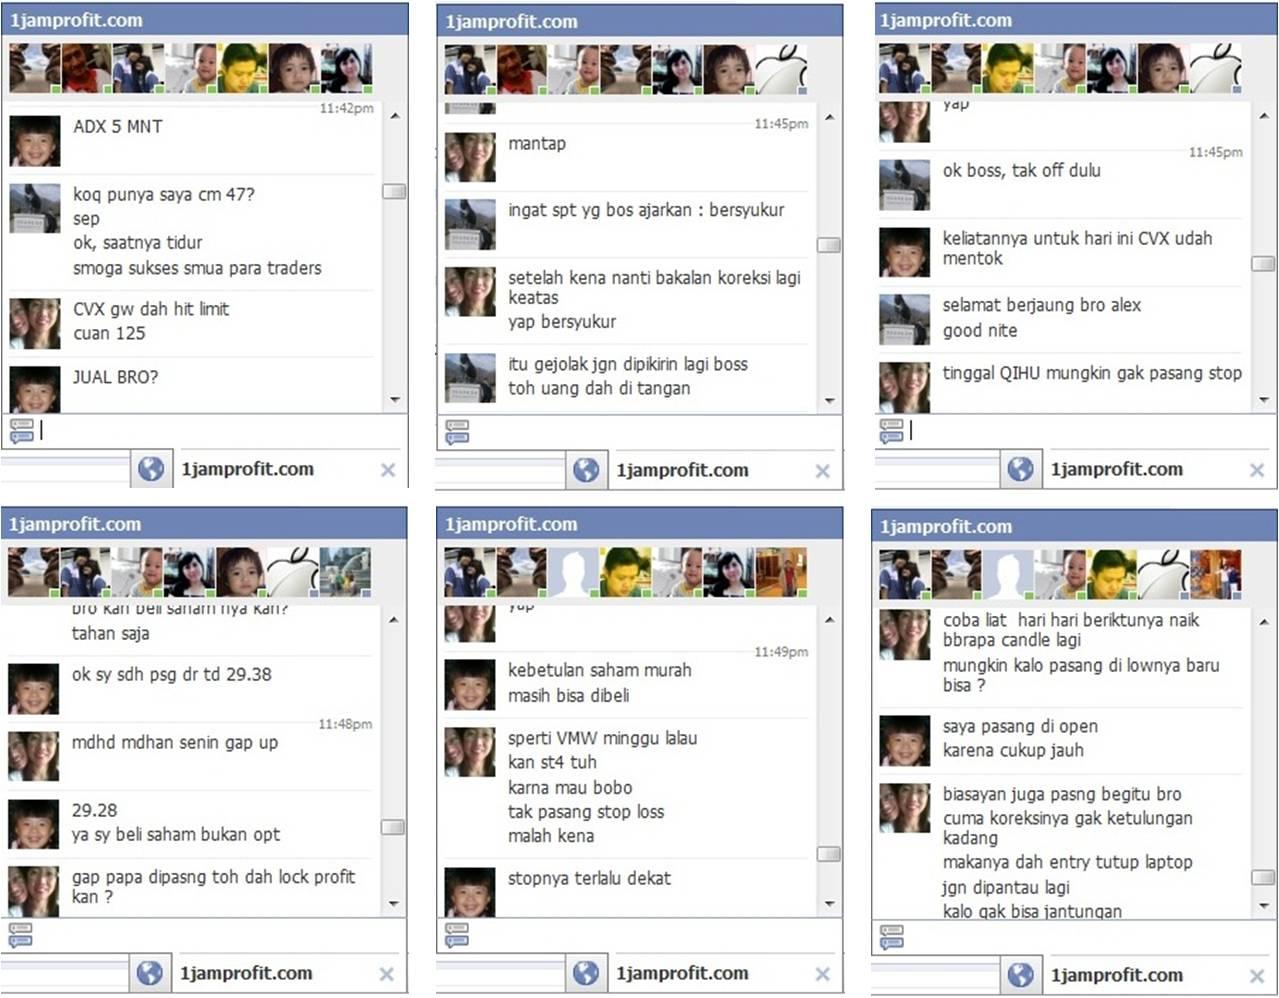 Kumpulan Status FB Terbaru 2018 Kata Kata Gokil Raja Gombal